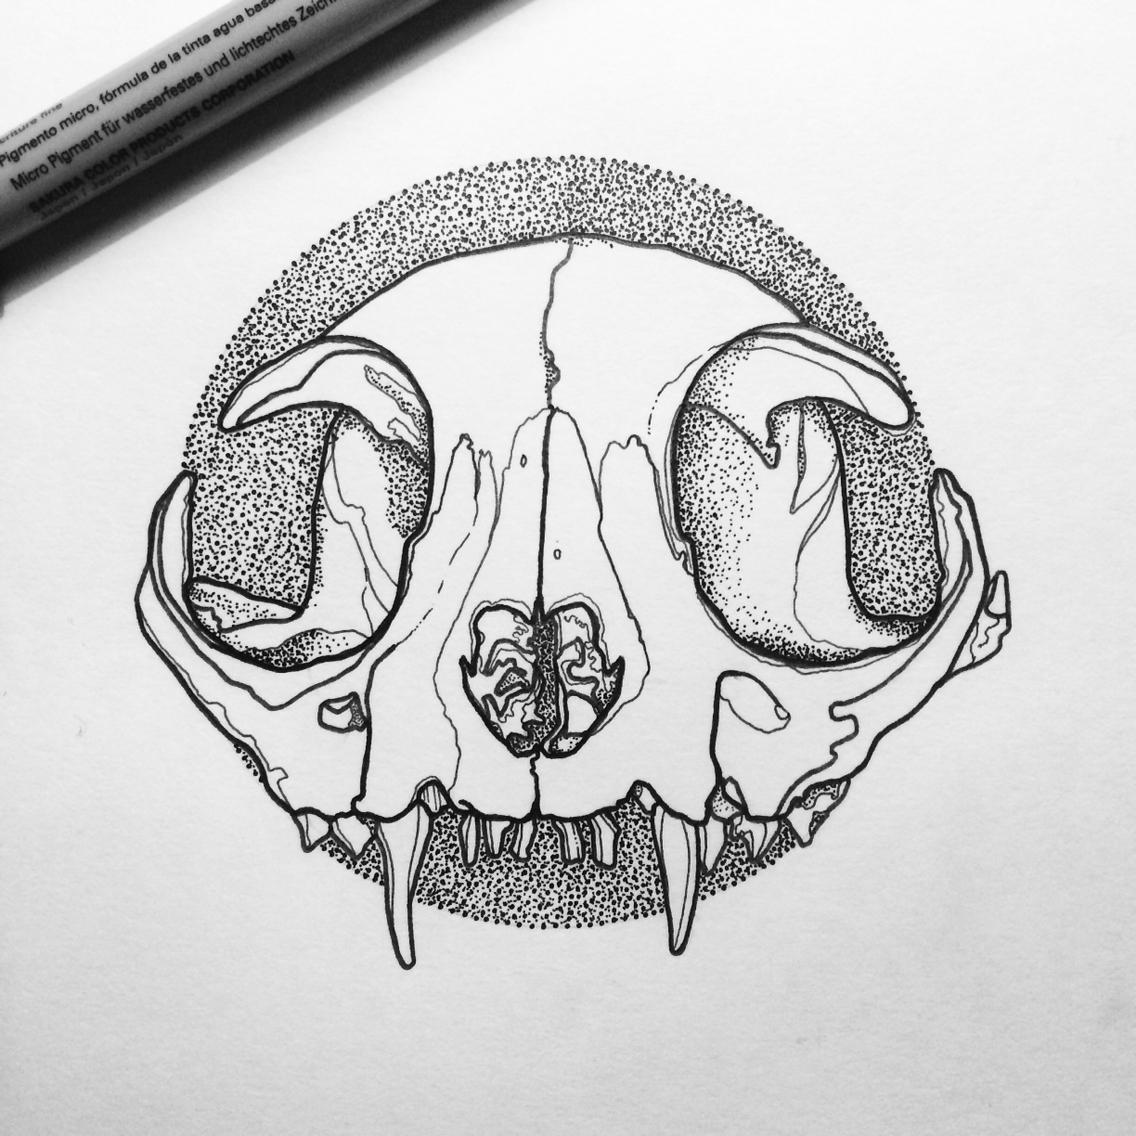 Drawn skull designer #linework #line #graphics #graphicdesign #graphic